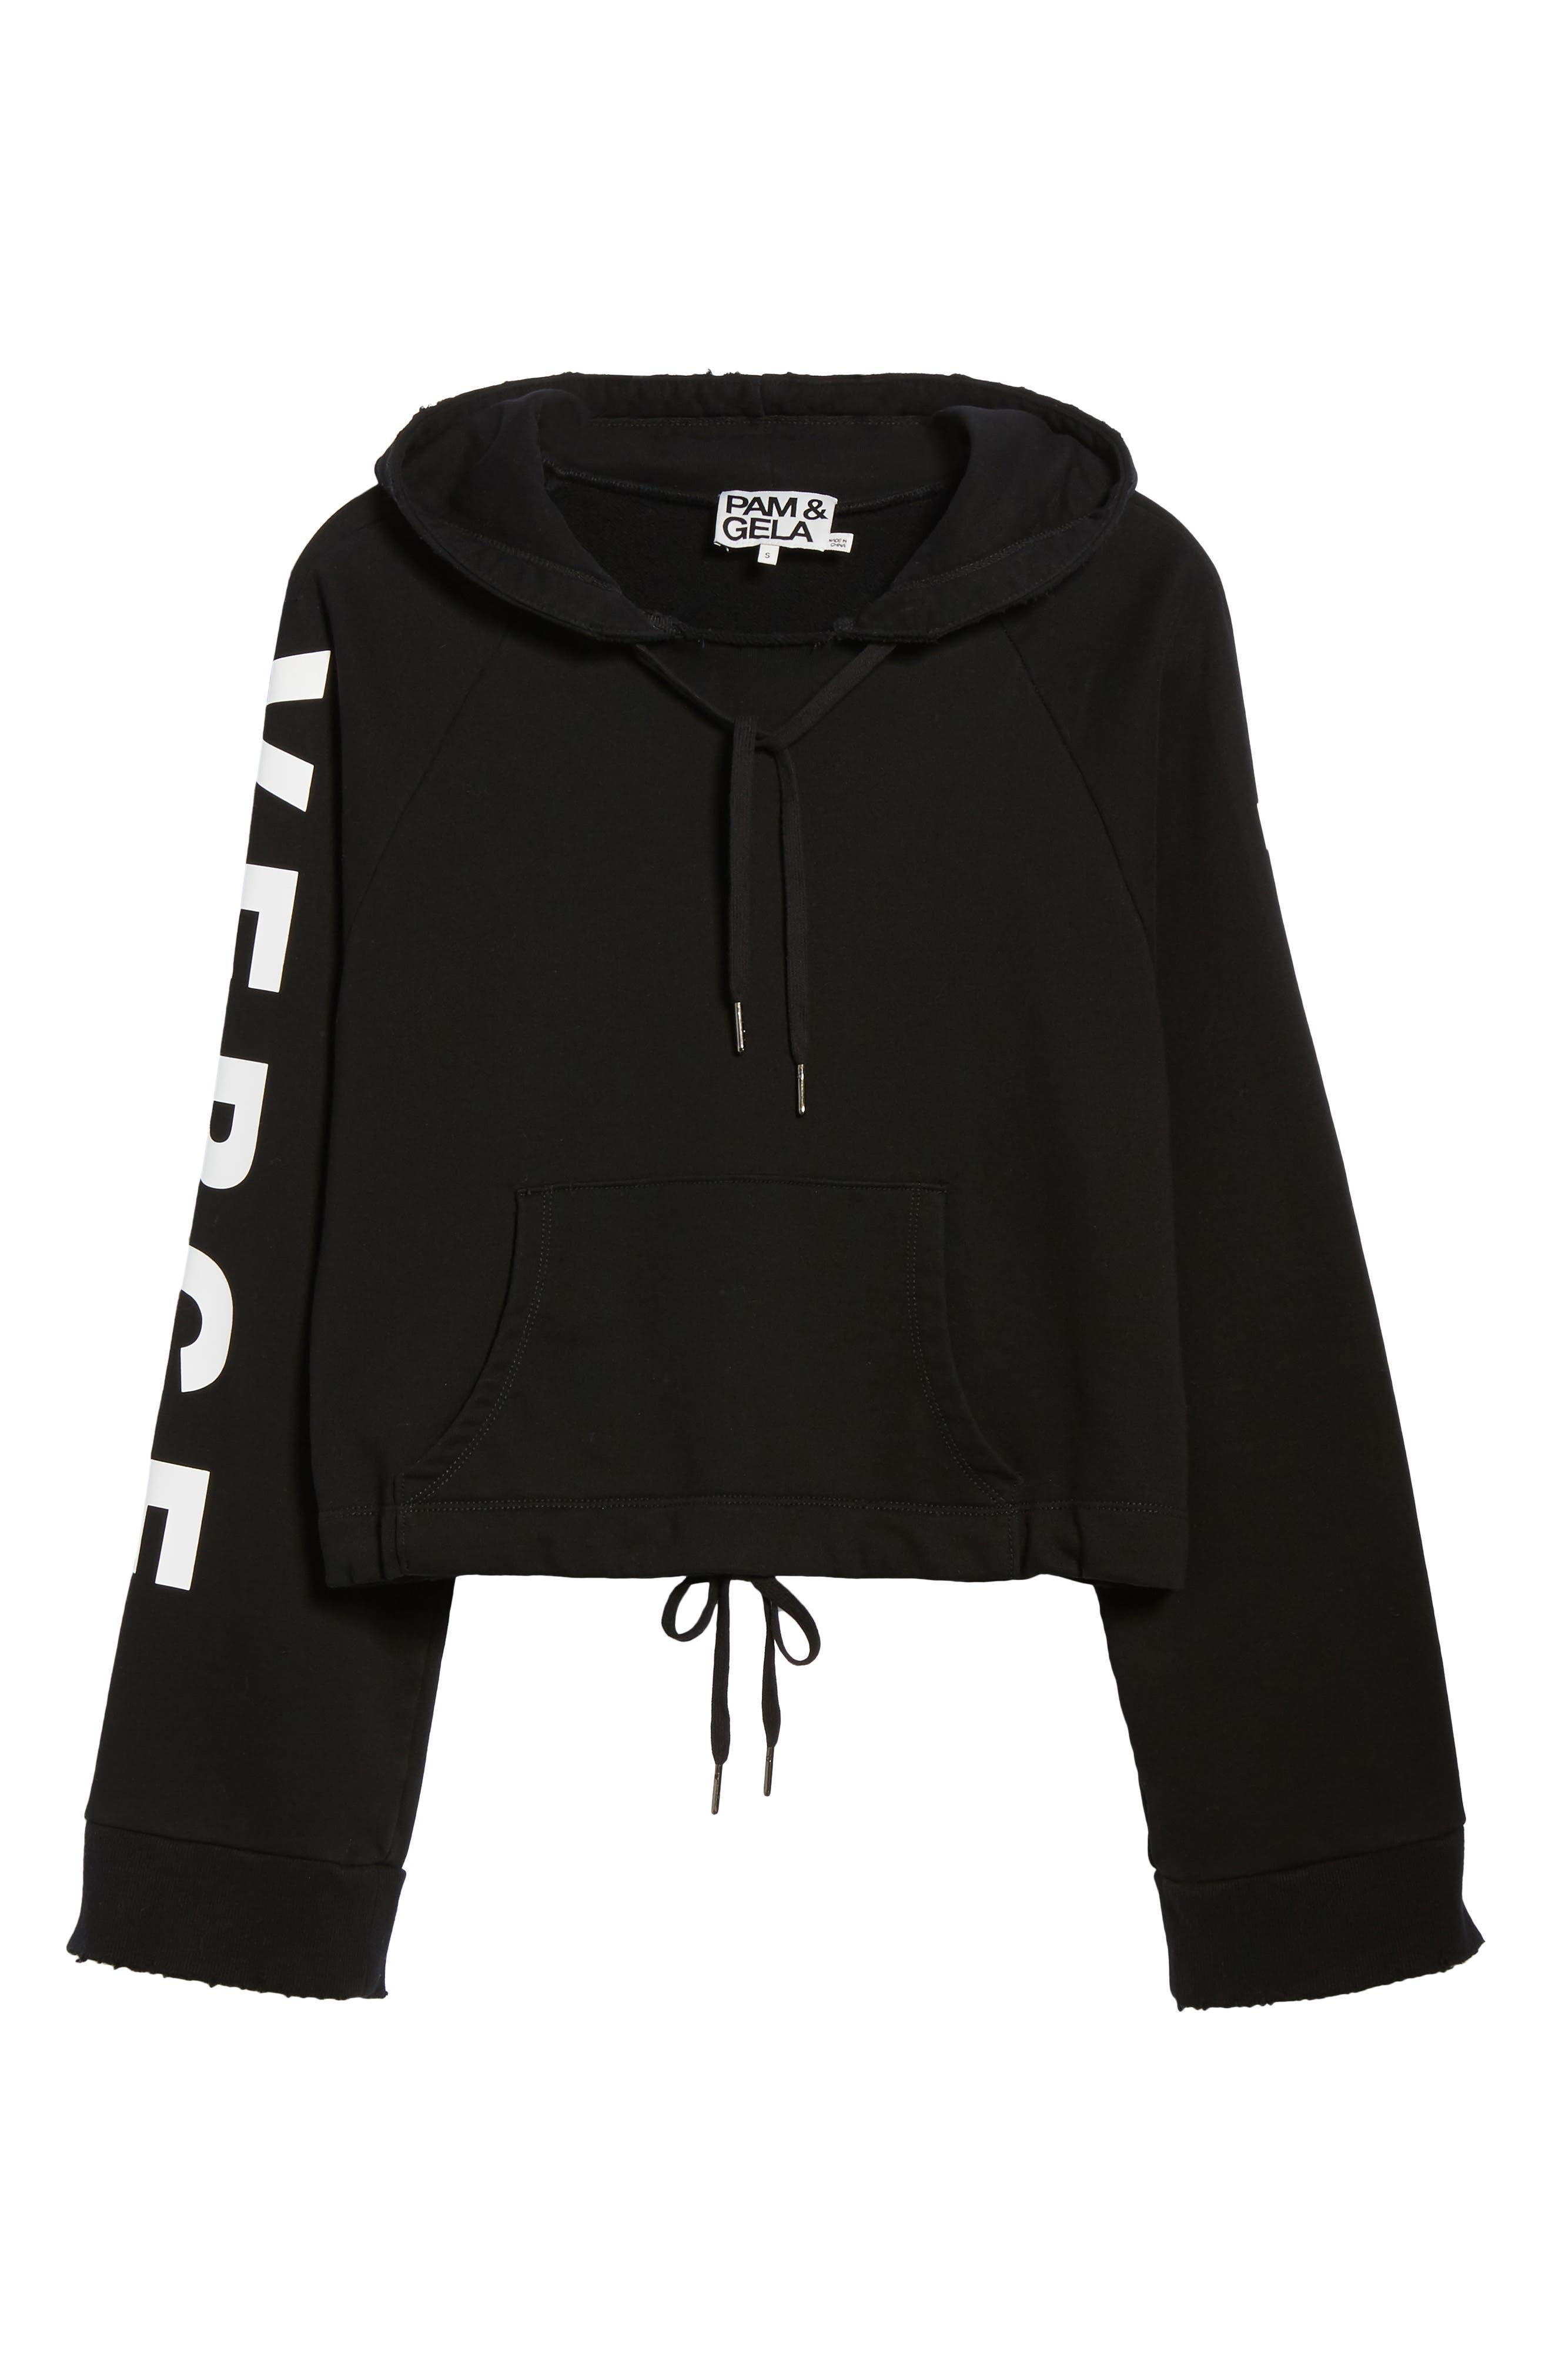 Girl on the Verge Crop Sweatshirt,                             Alternate thumbnail 6, color,                             Black